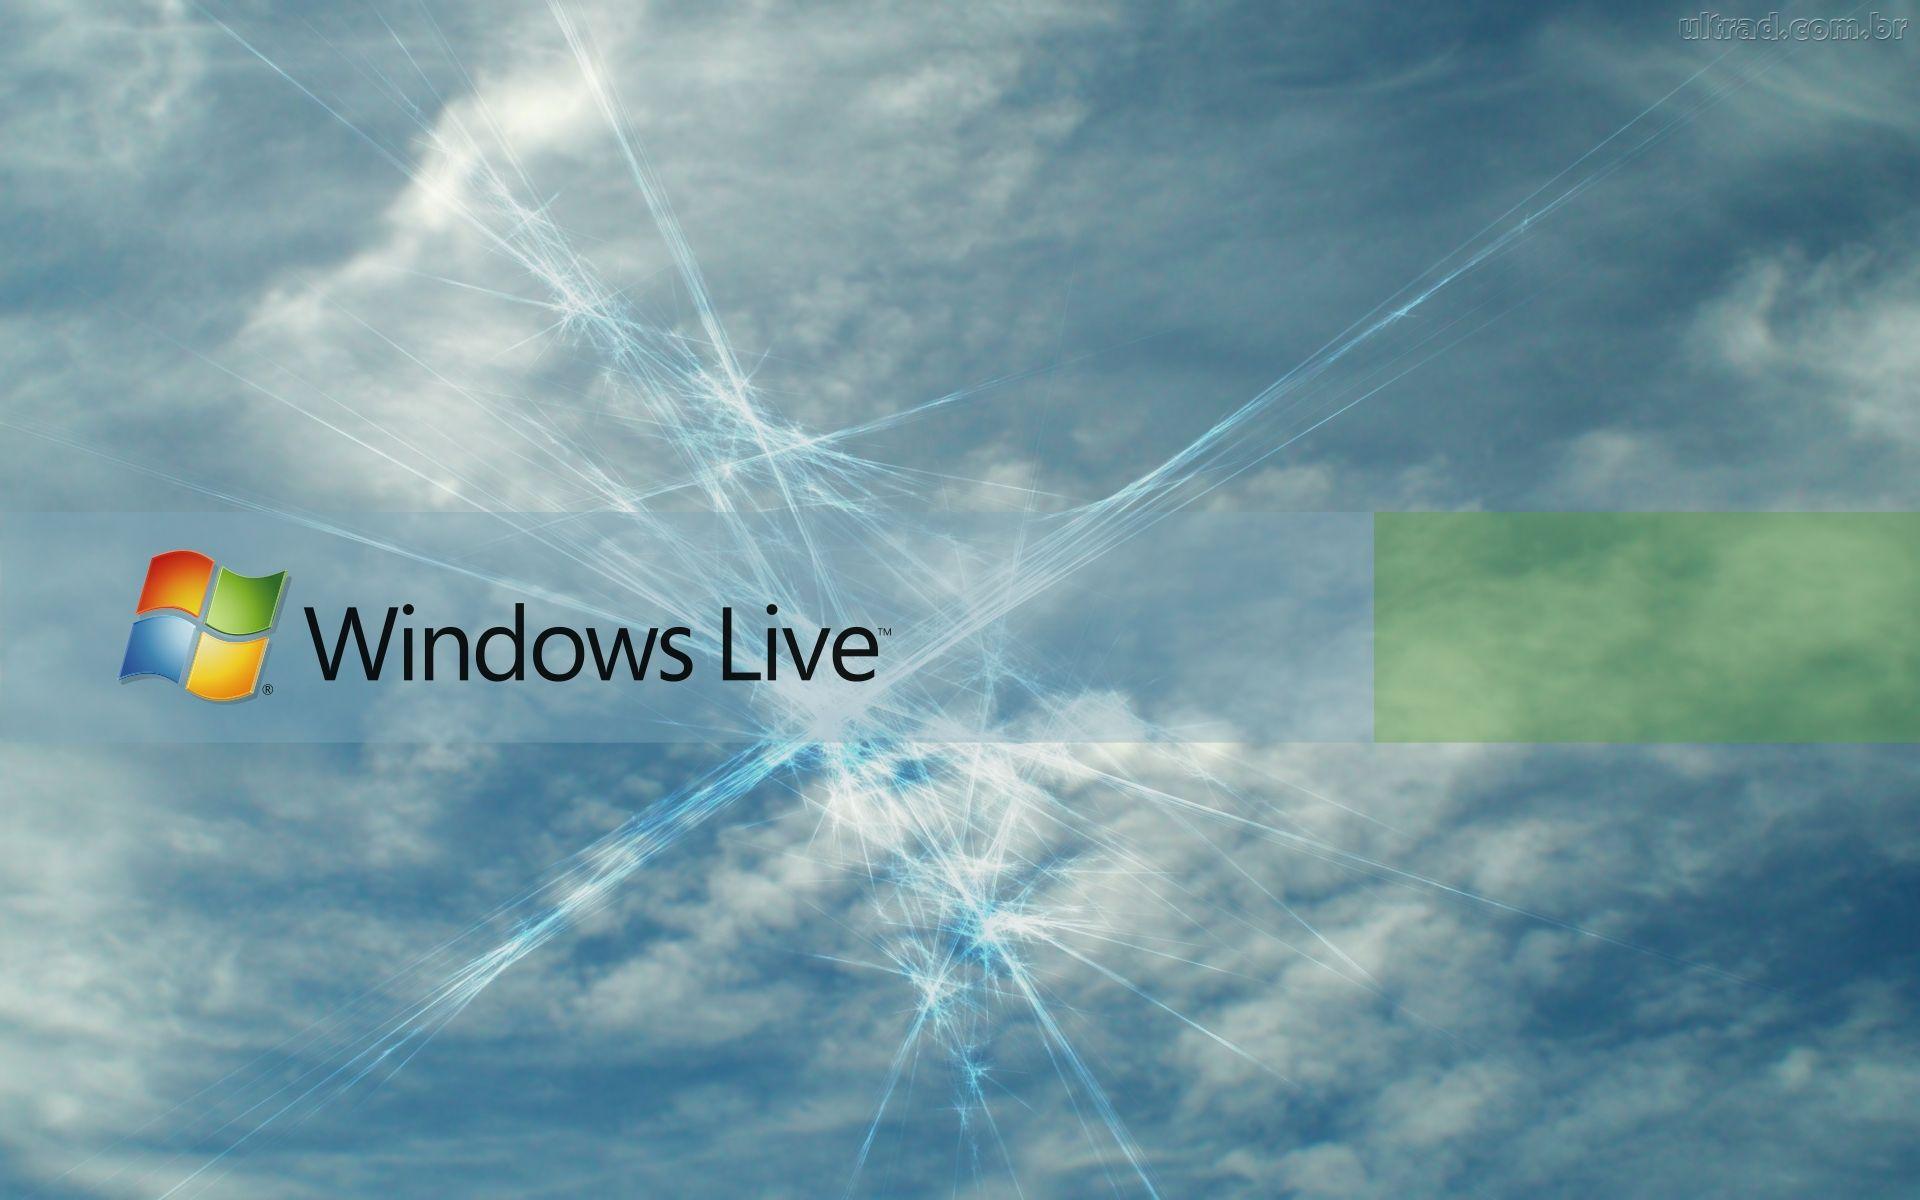 Windows Live 1920x1200